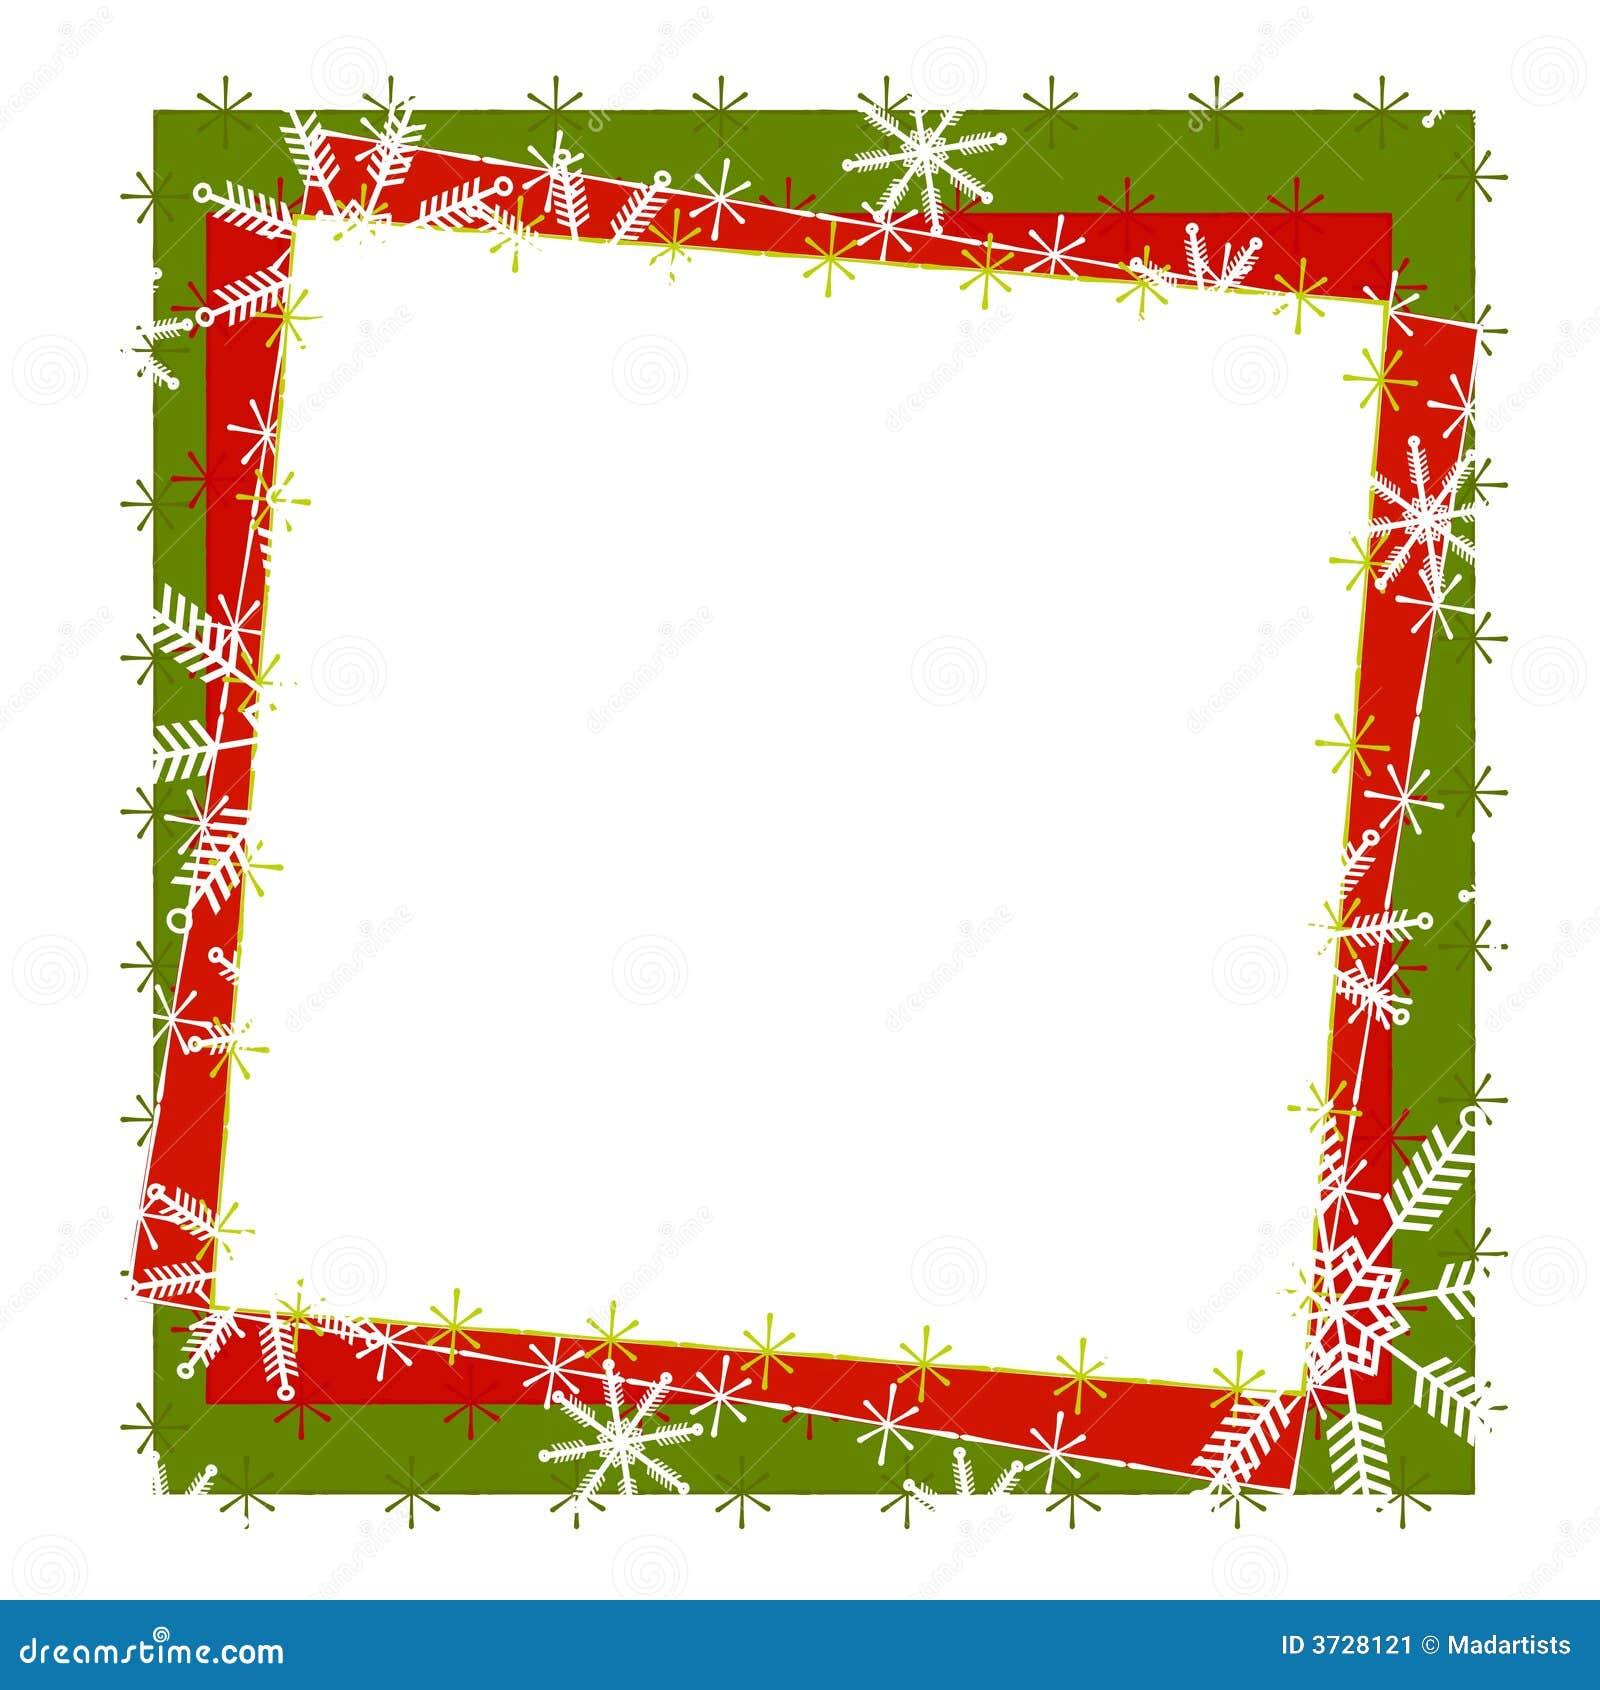 Rustic Snowflake Frame or Border